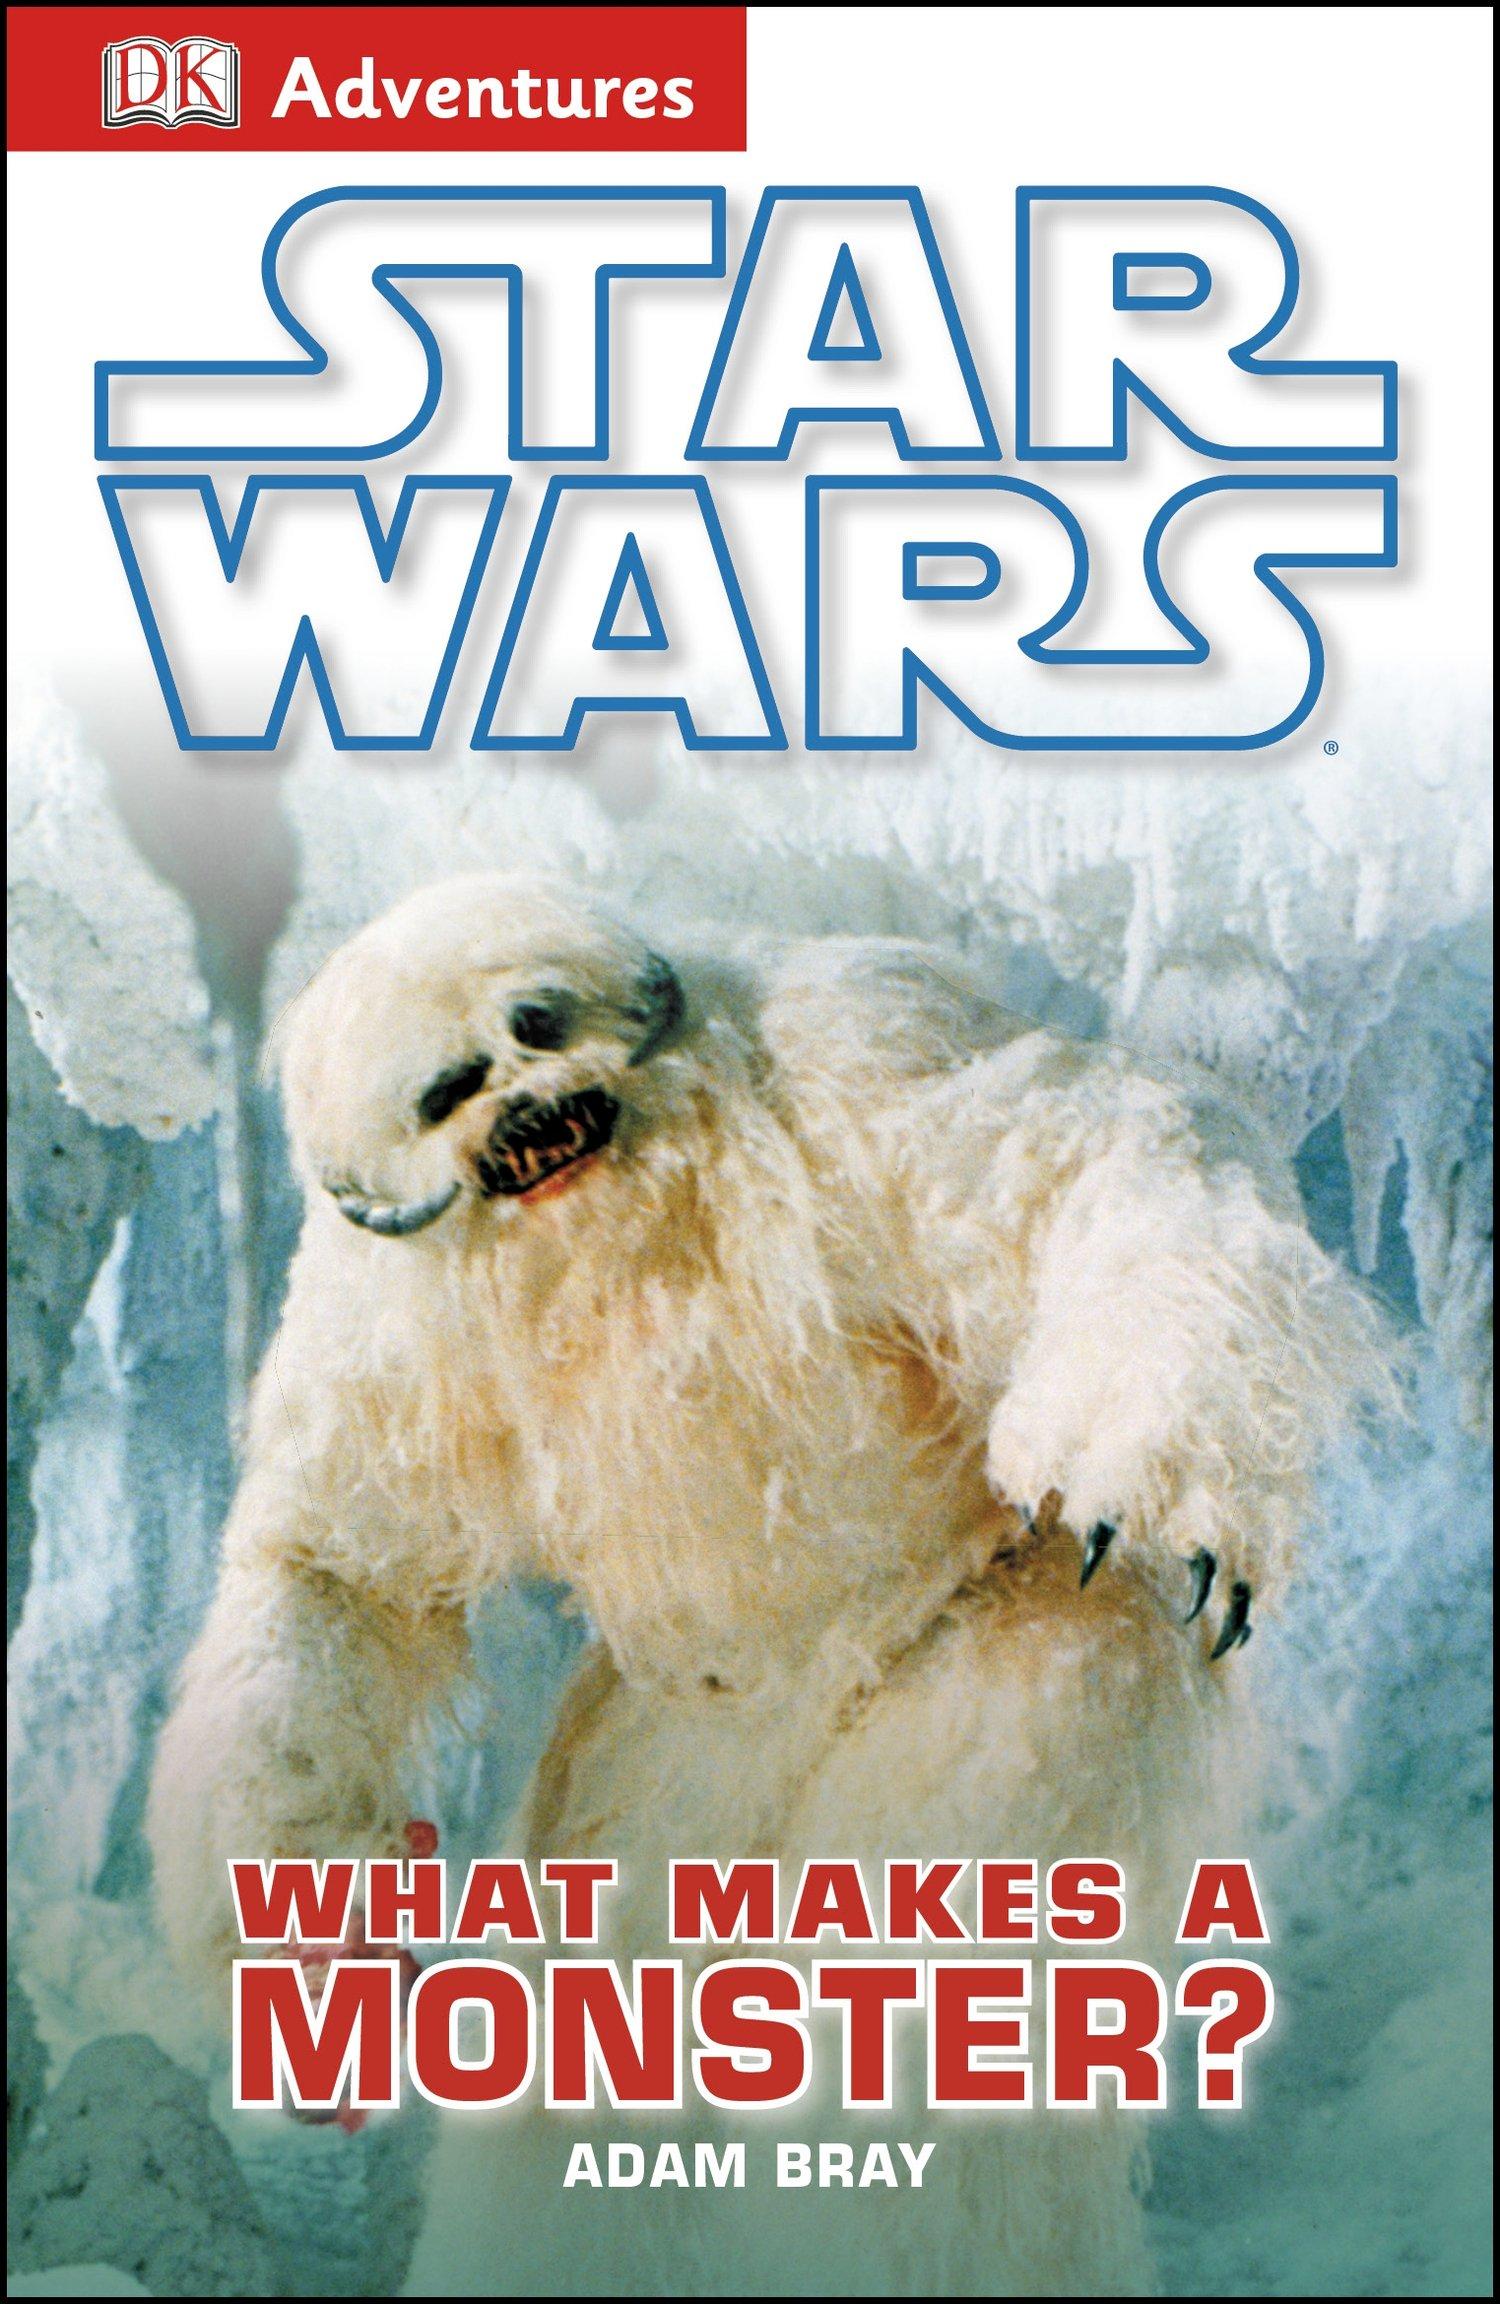 DK Adventures: Star Wars: What Makes A Monster? by DK Children